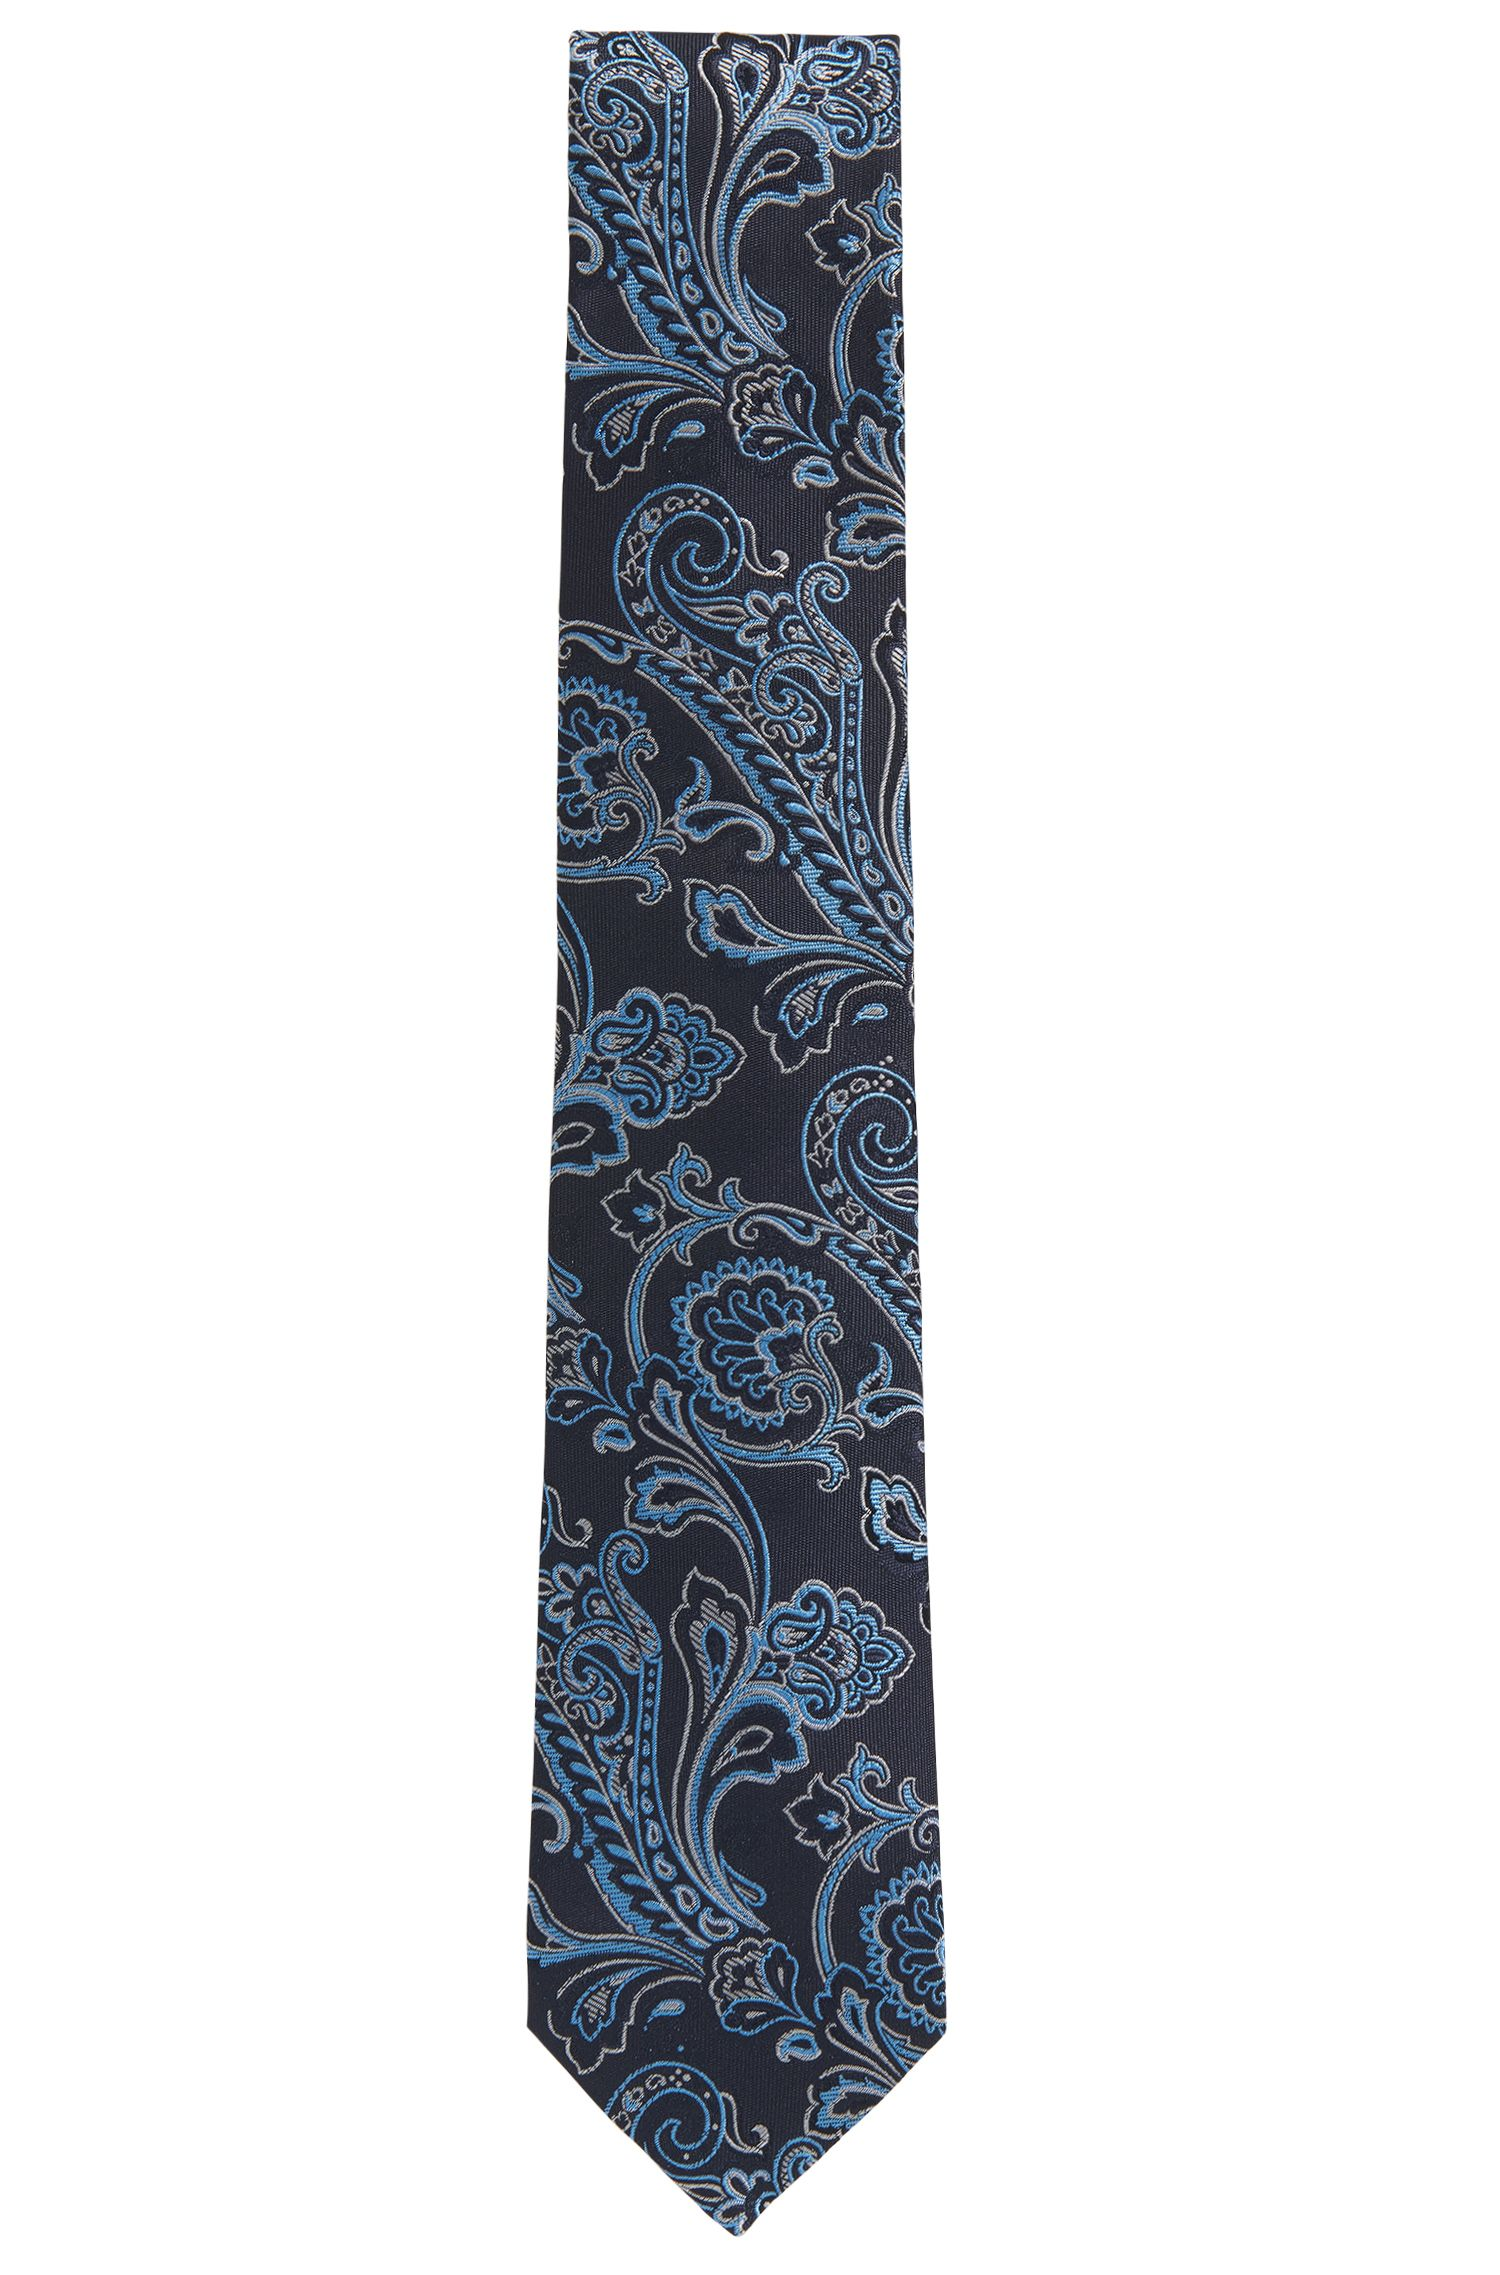 Paisley Embroidered Italian Silk Tie